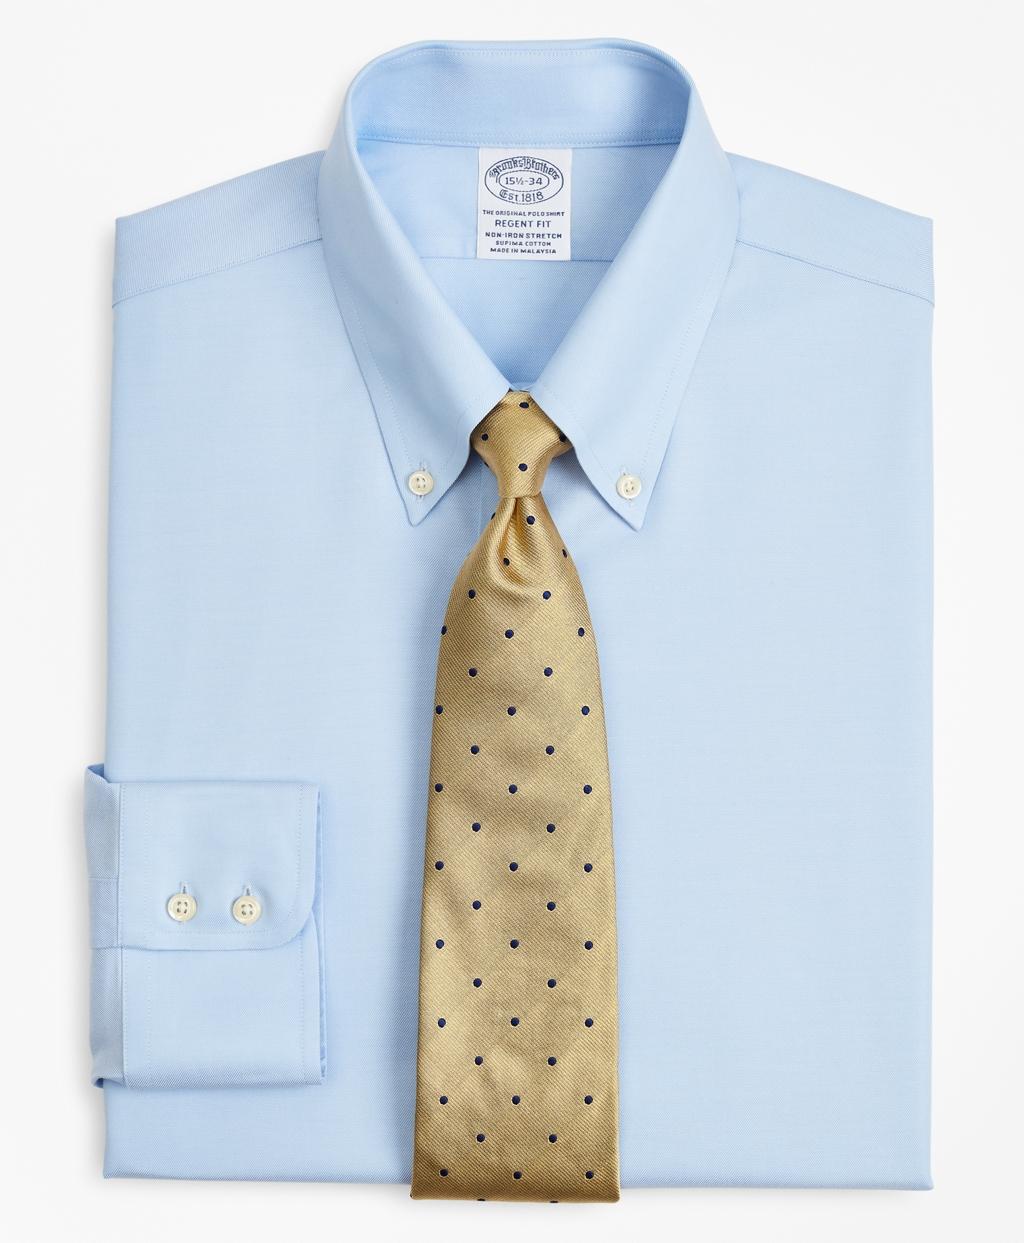 Brooksbrothers Stretch Regent Regular-Fit Dress Shirt, Non-Iron Twill Button-Down Collar